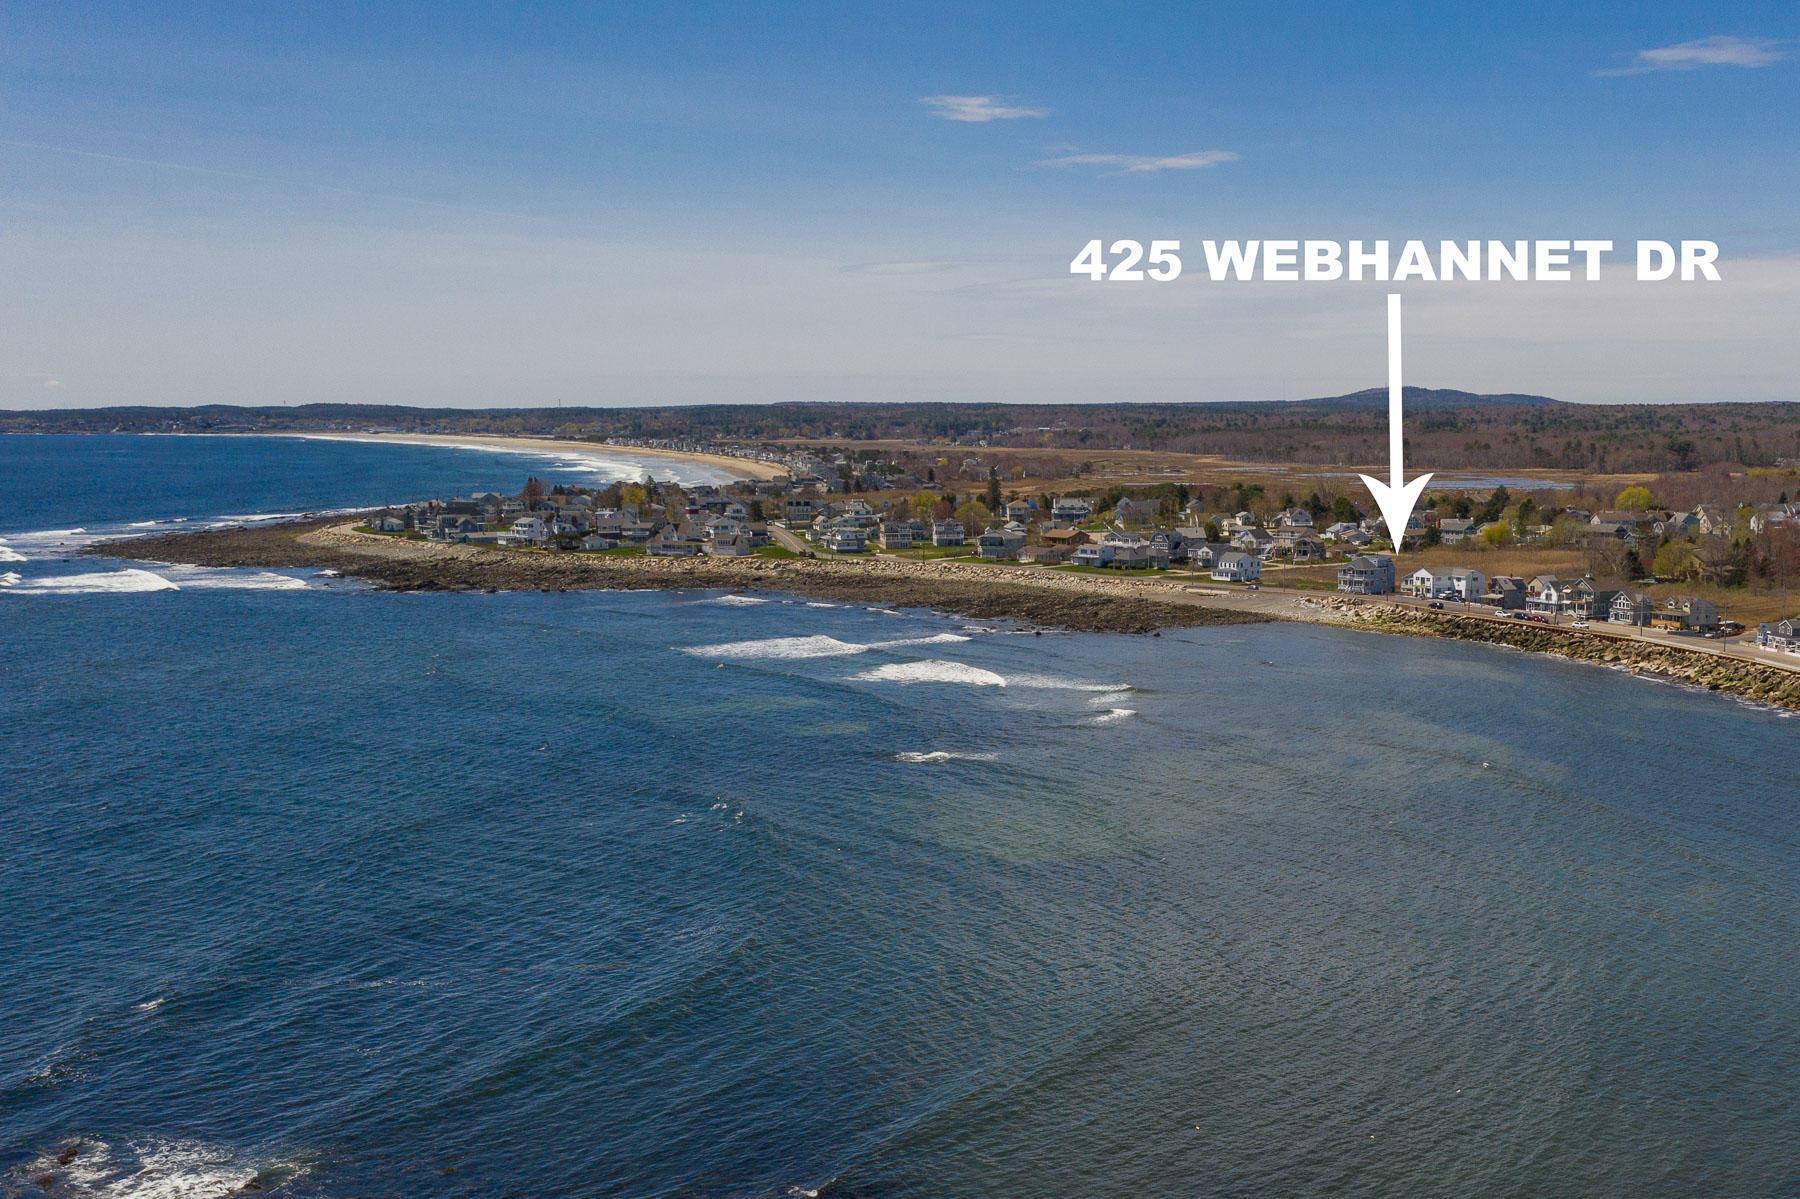 425 Webhannet Drive